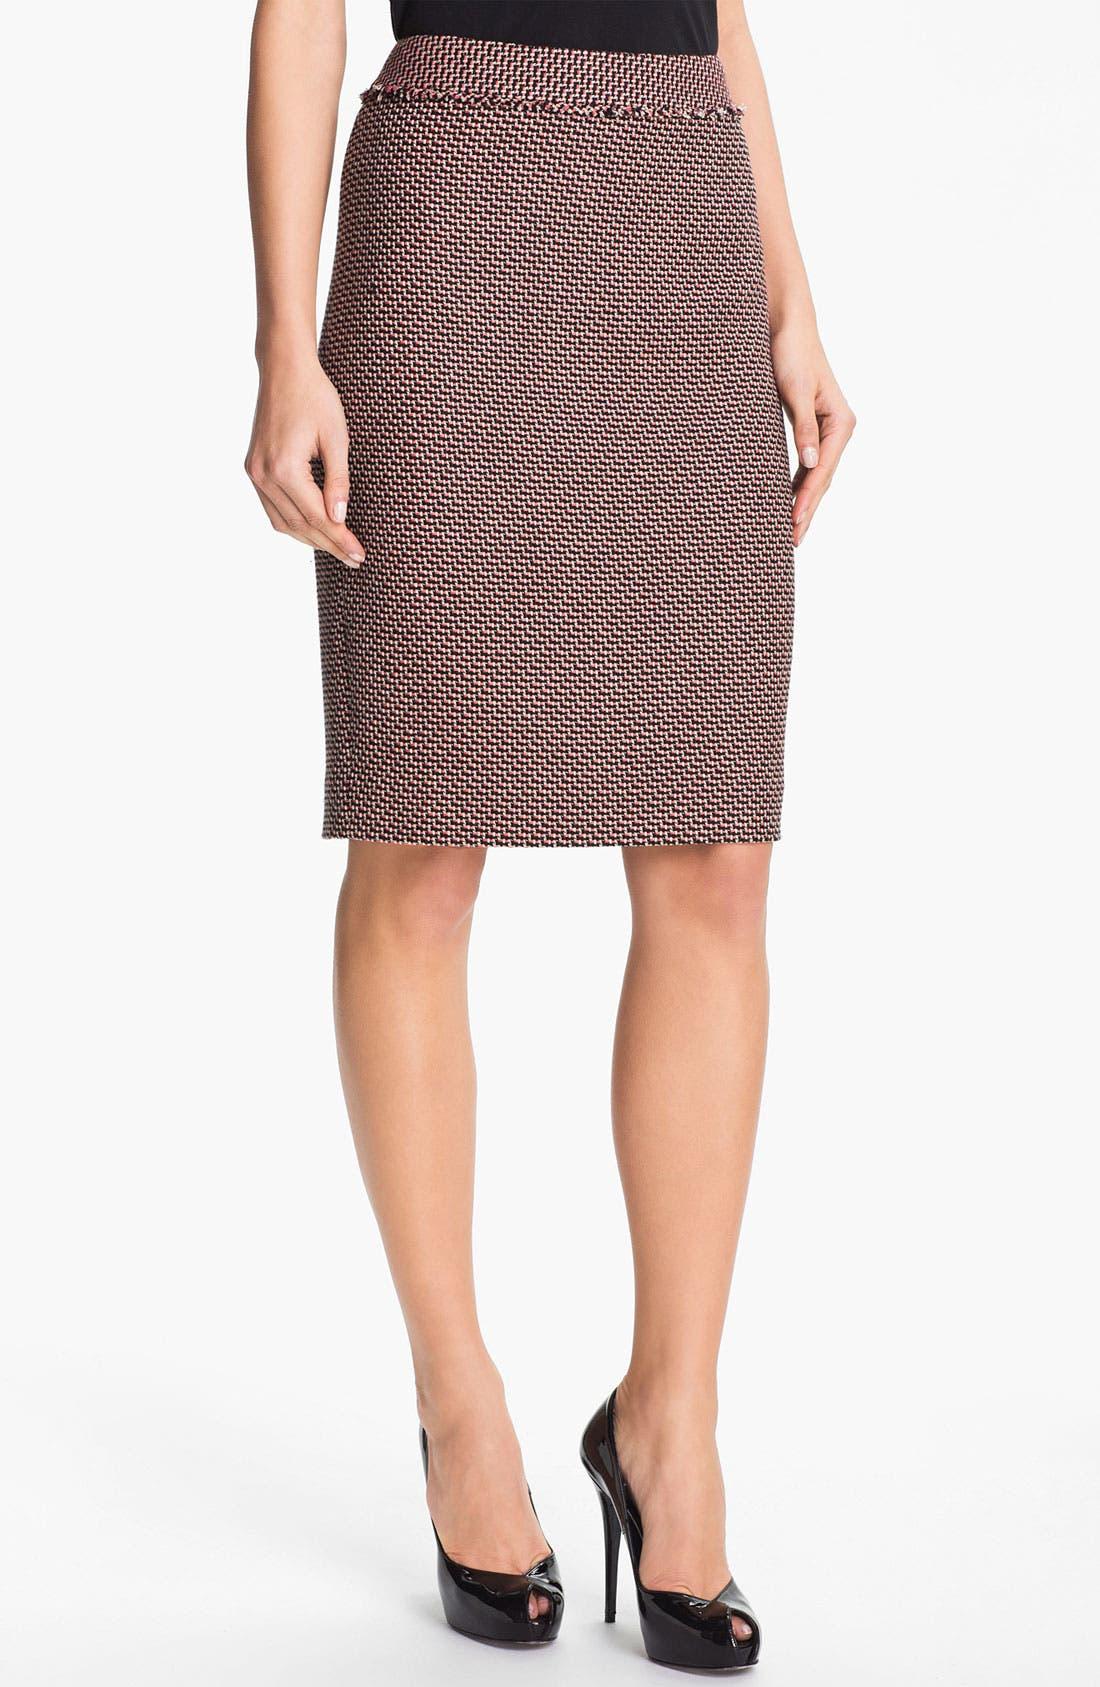 Alternate Image 1 Selected - Classiques Entier® 'Venetto Zigzag' Skirt